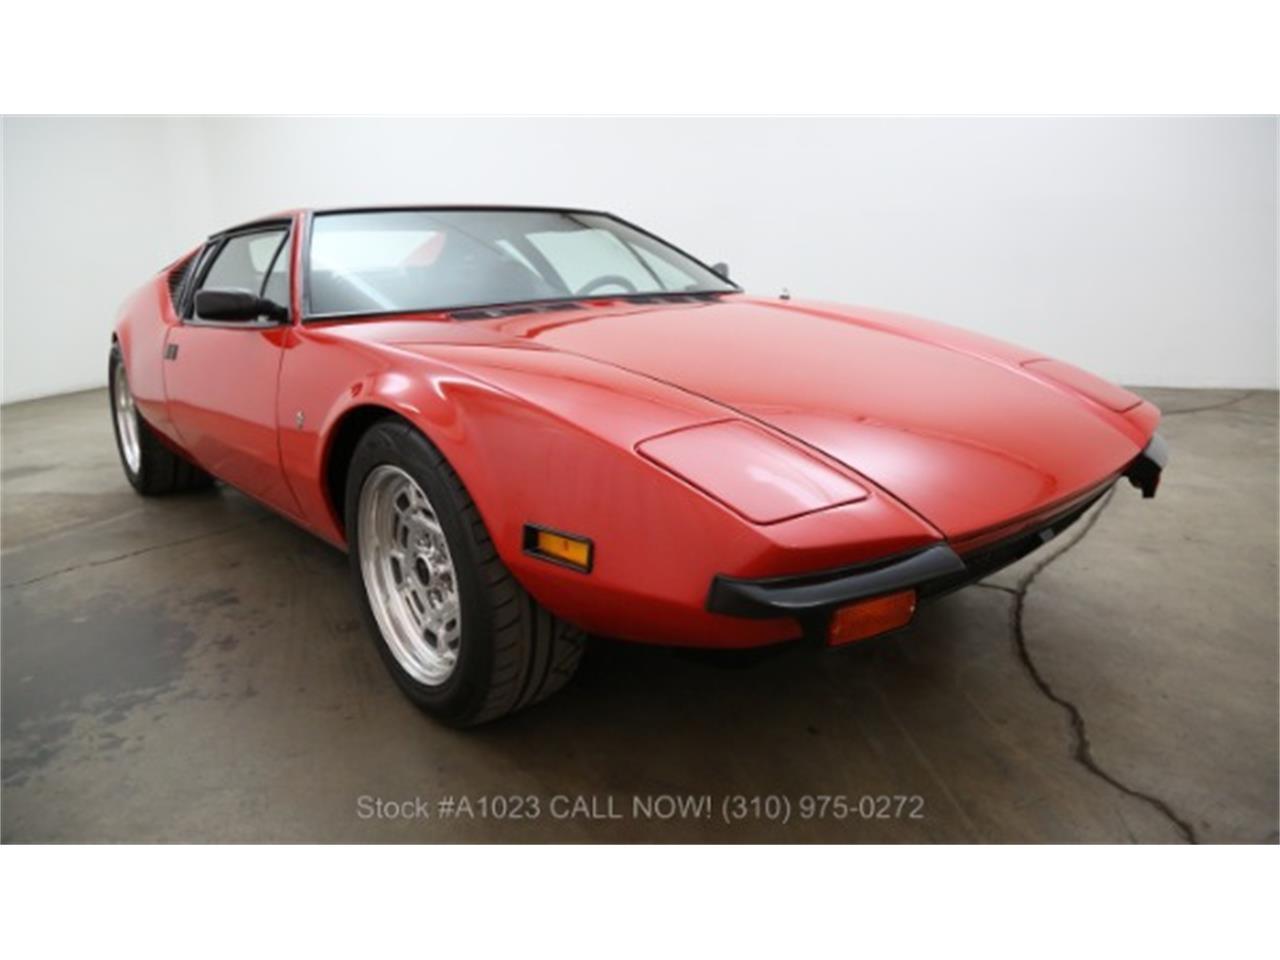 Detomaso Pantera For Sale >> For Sale 1971 Detomaso Pantera In Beverly Hills California